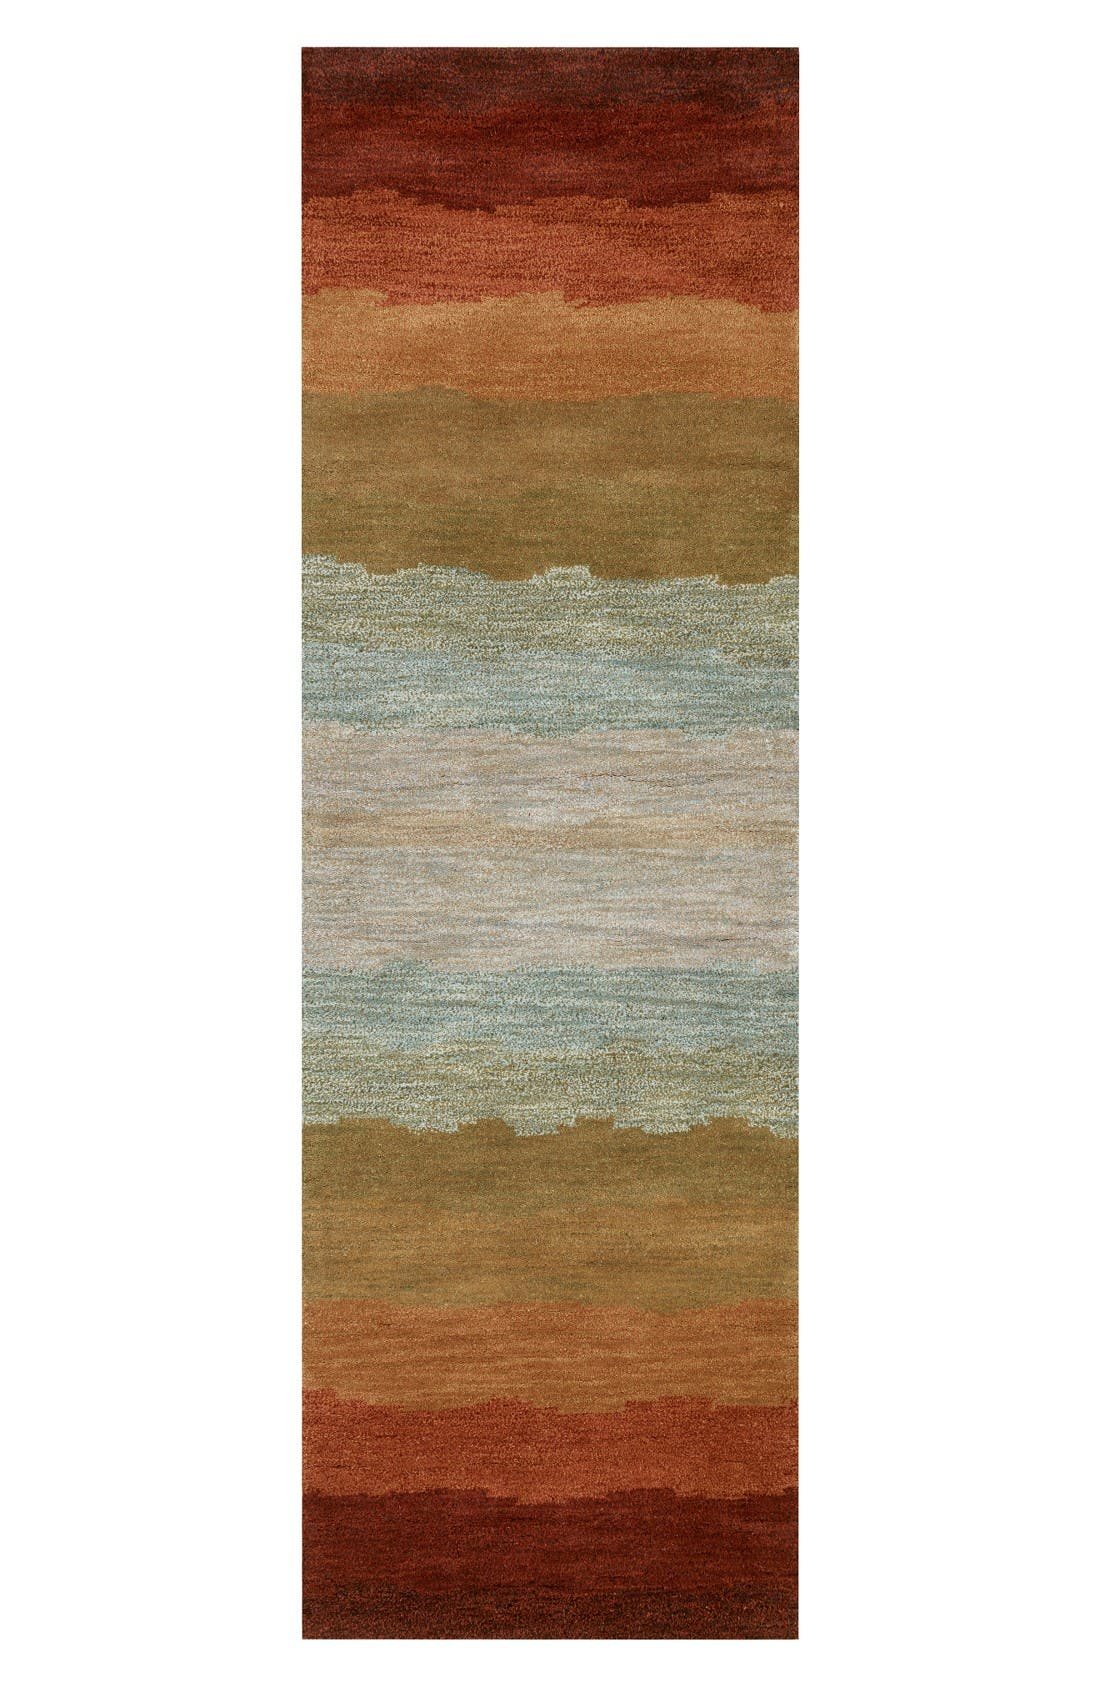 Desert Oasis Hand Tufted Wool Area Rug,                             Alternate thumbnail 2, color,                             Rust